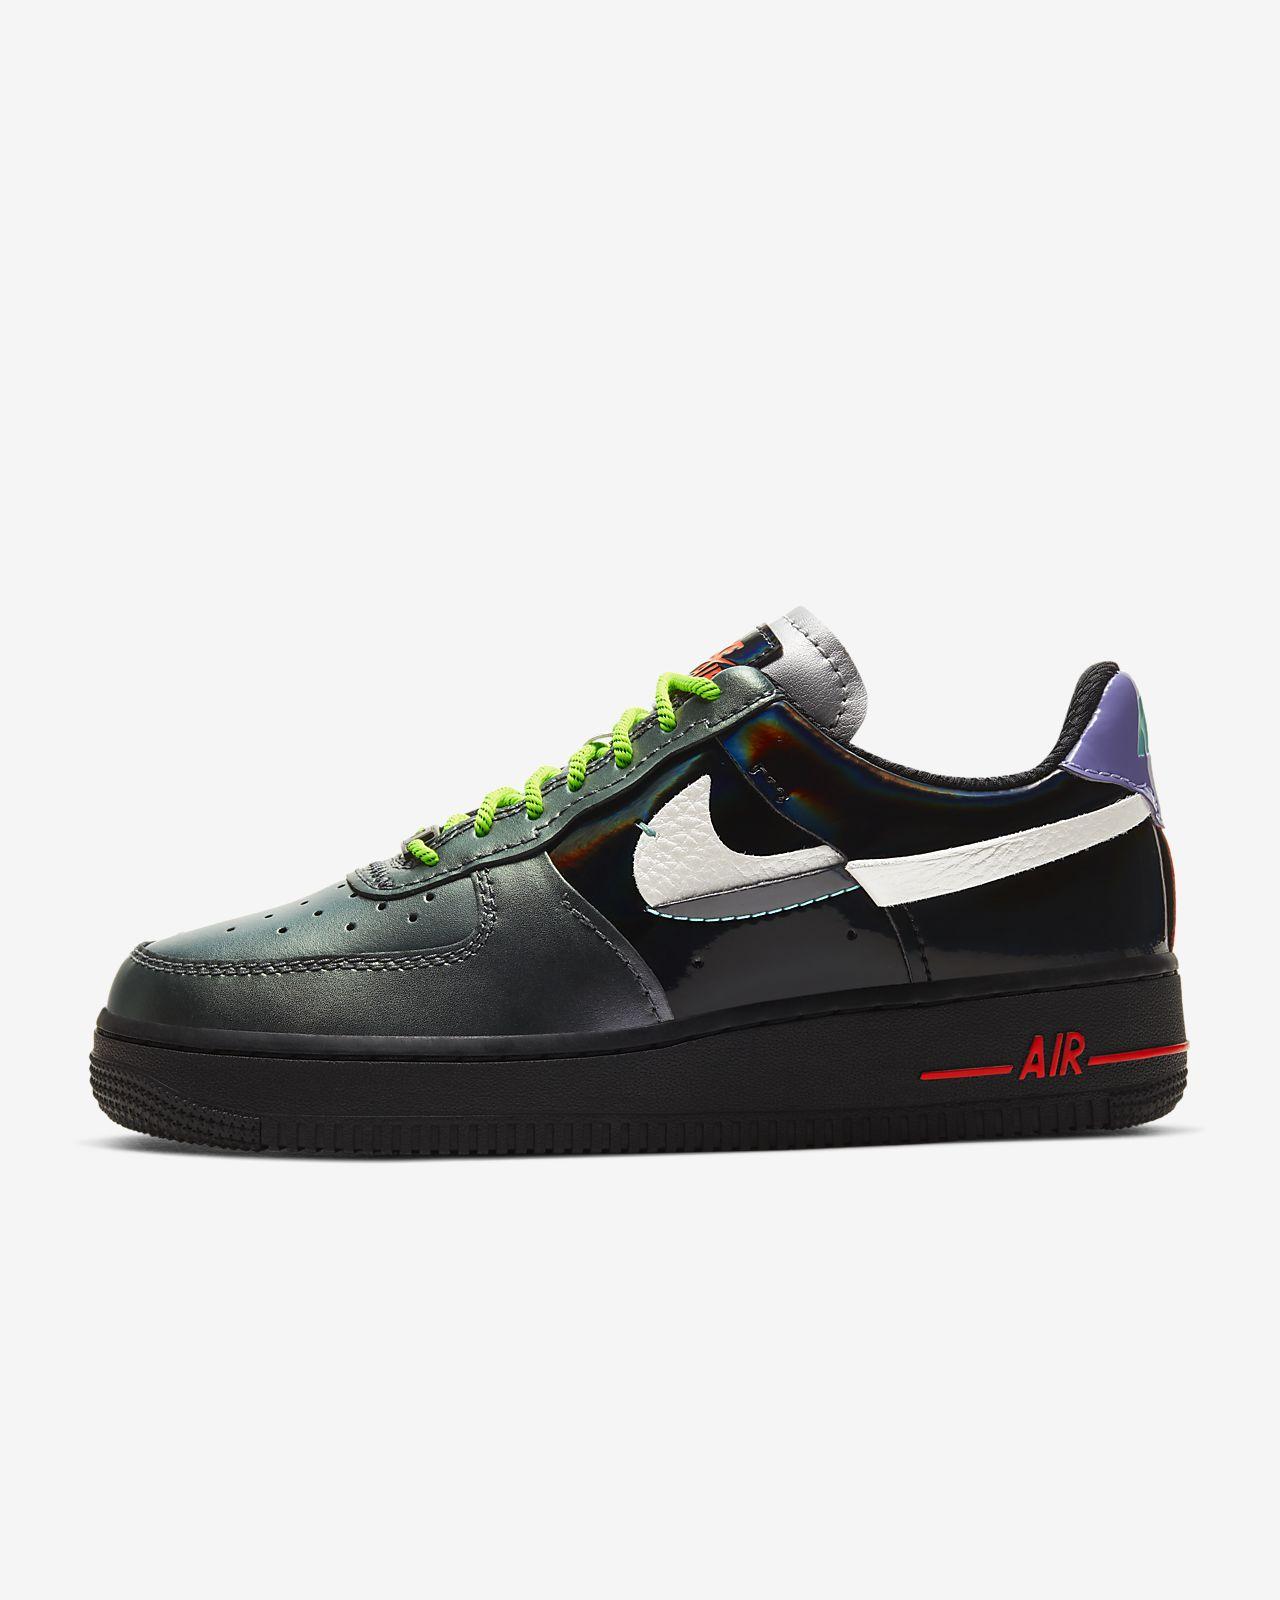 Dámská bota Nike Air Force 1 '07 LX